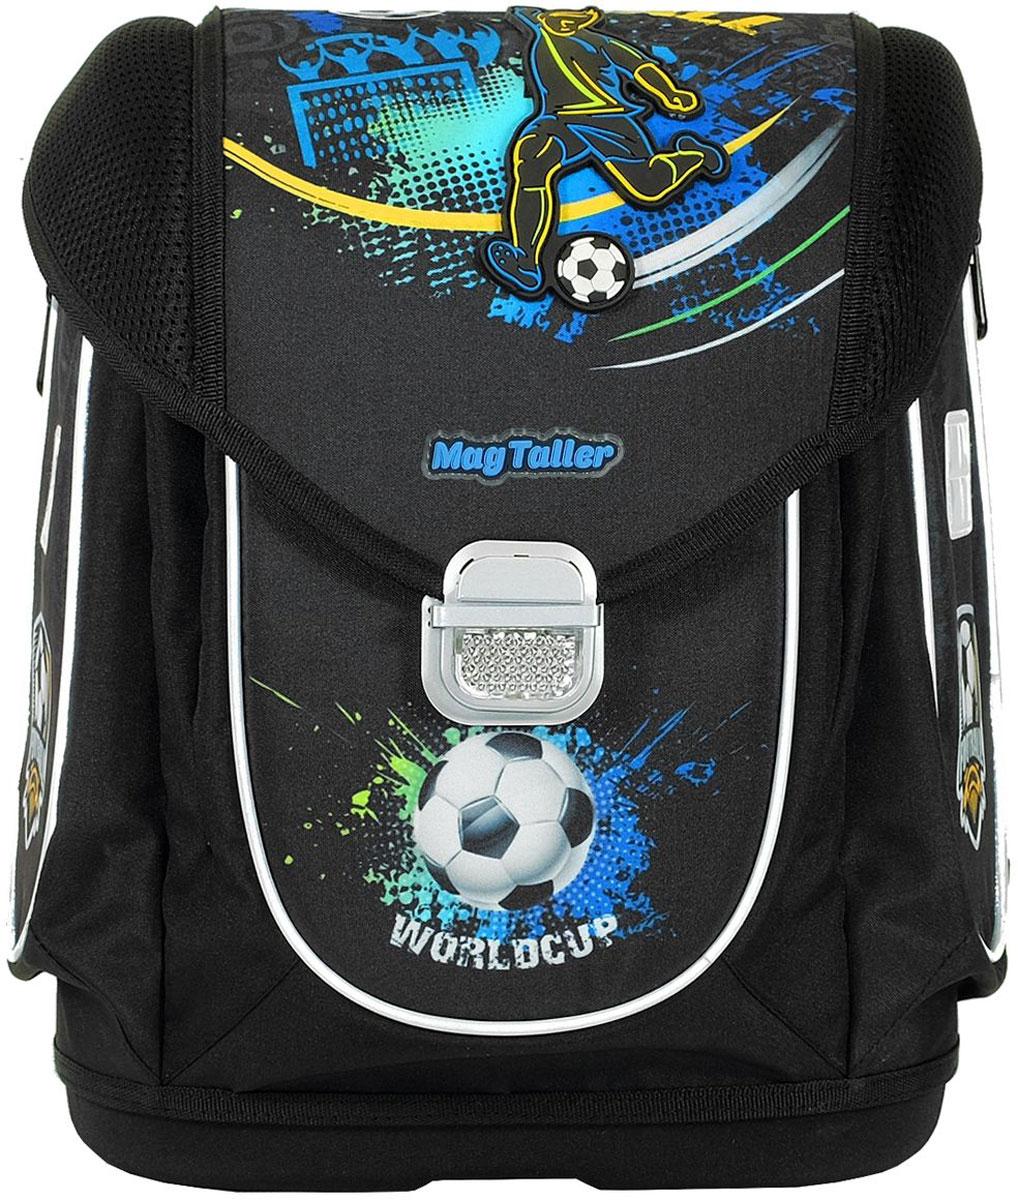 Magtaller Ранец школьный Ezzy III Football ранец kite kite ранец школьный 529 каркасный speed